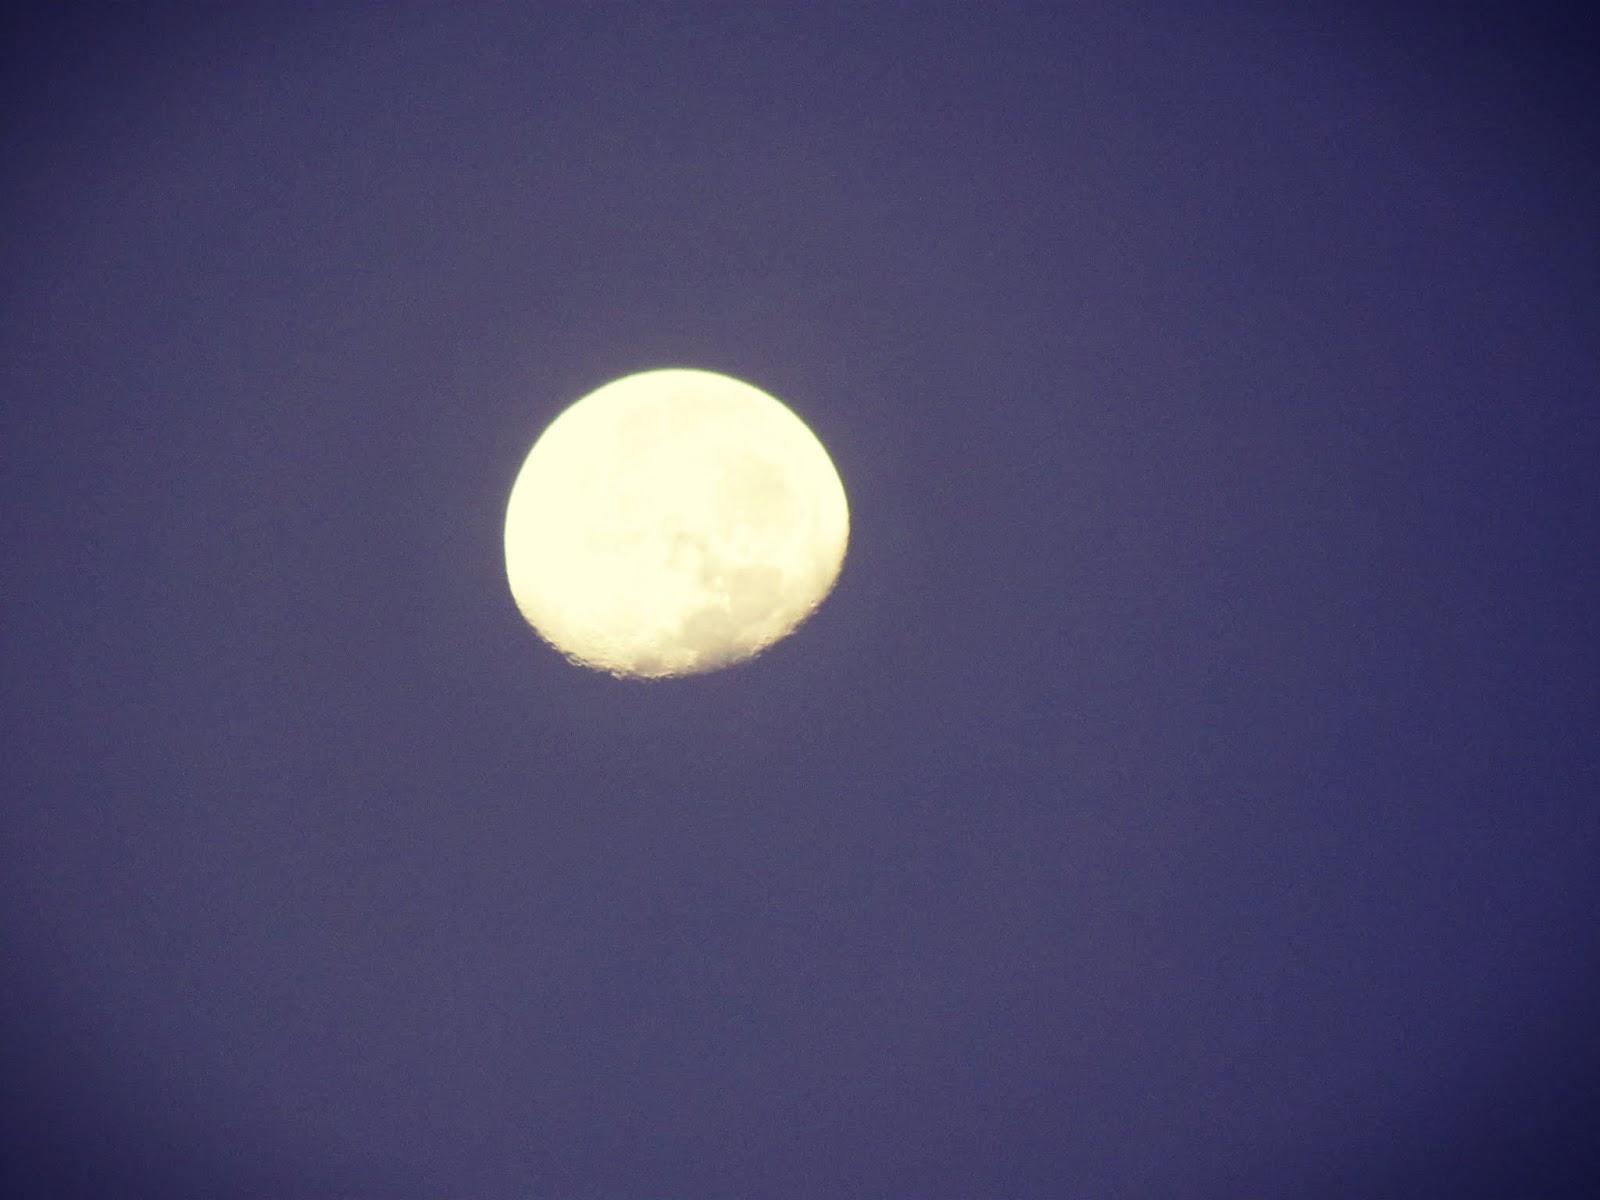 A waning full moon in Aries October 2019 Harvest Moon, Full Moon, Transition Moon Phase, Hunter's Moon